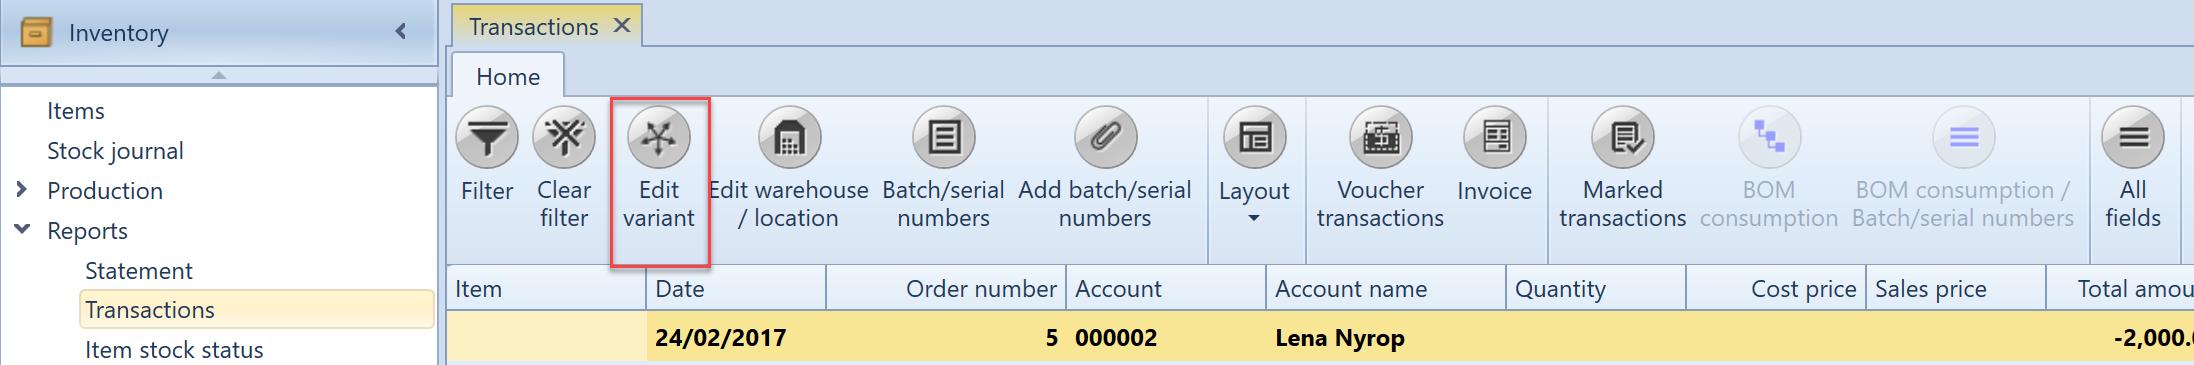 , Inventory transactions, Uniconta